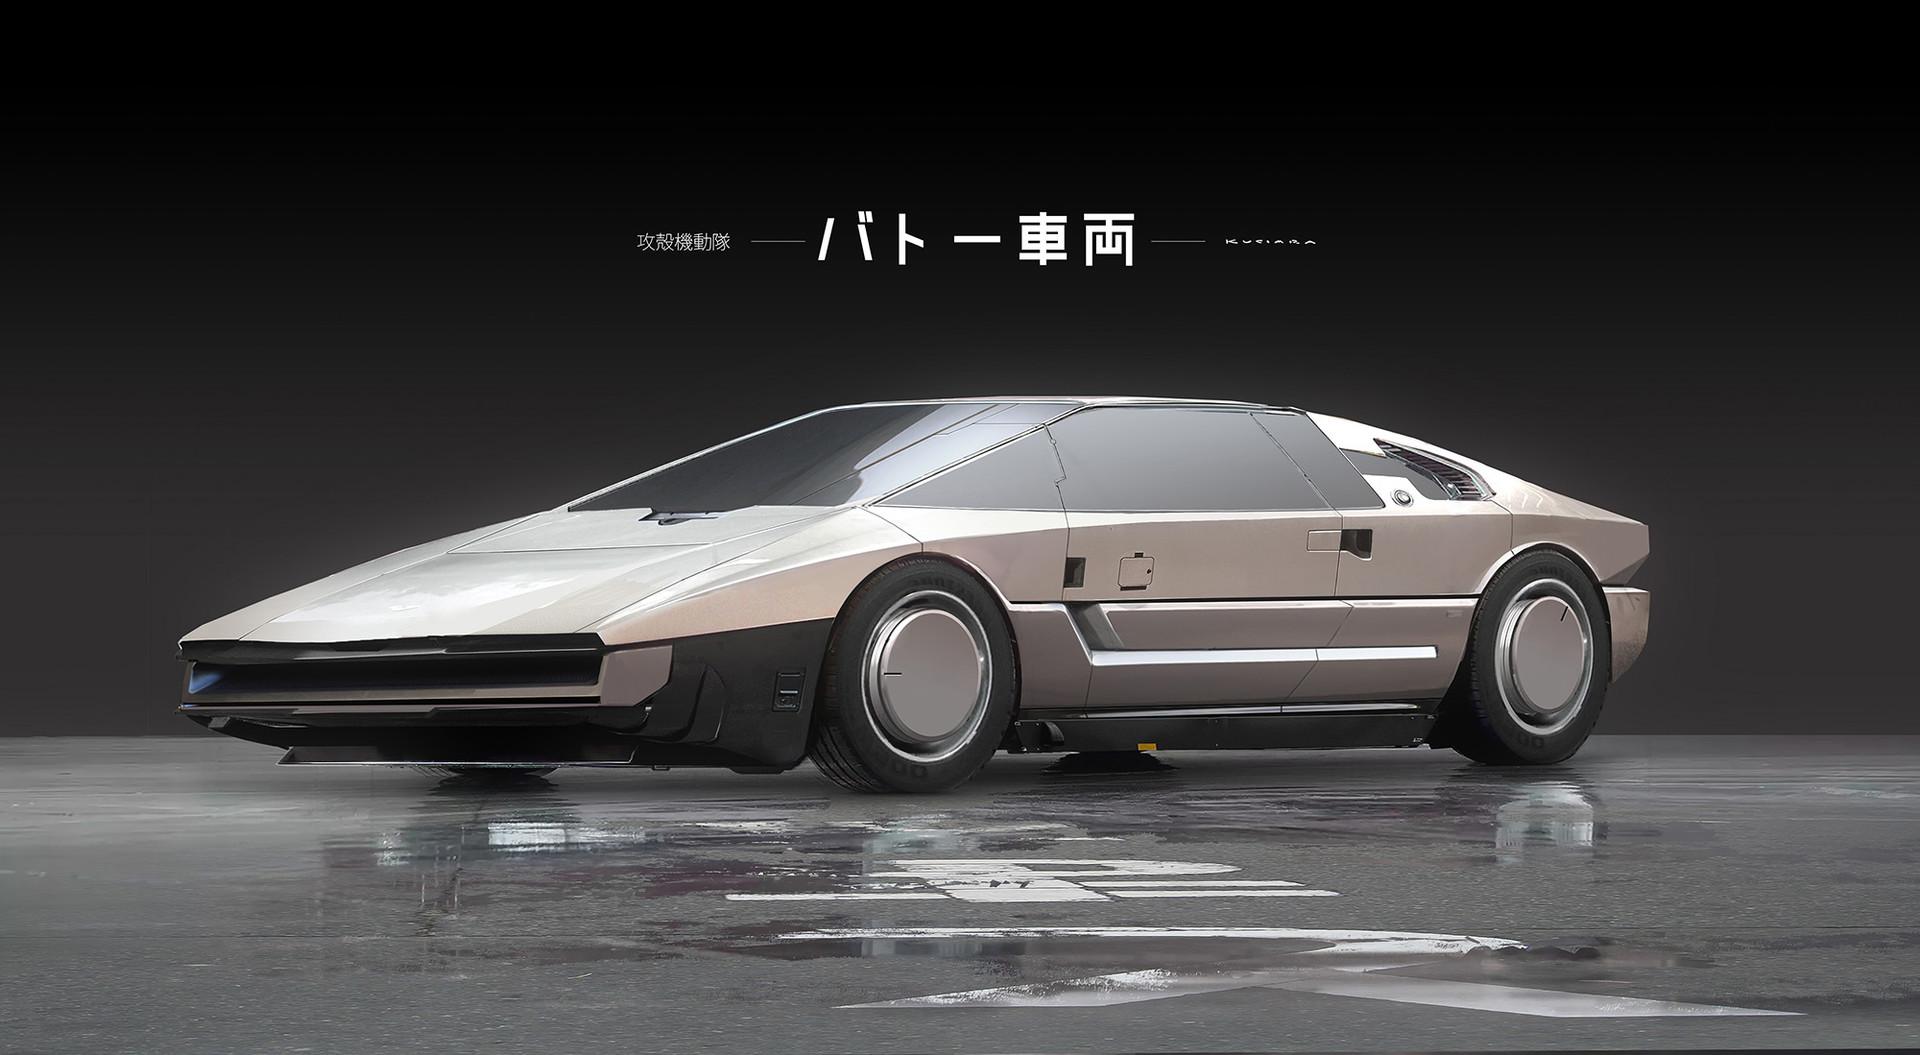 S Car Artwork